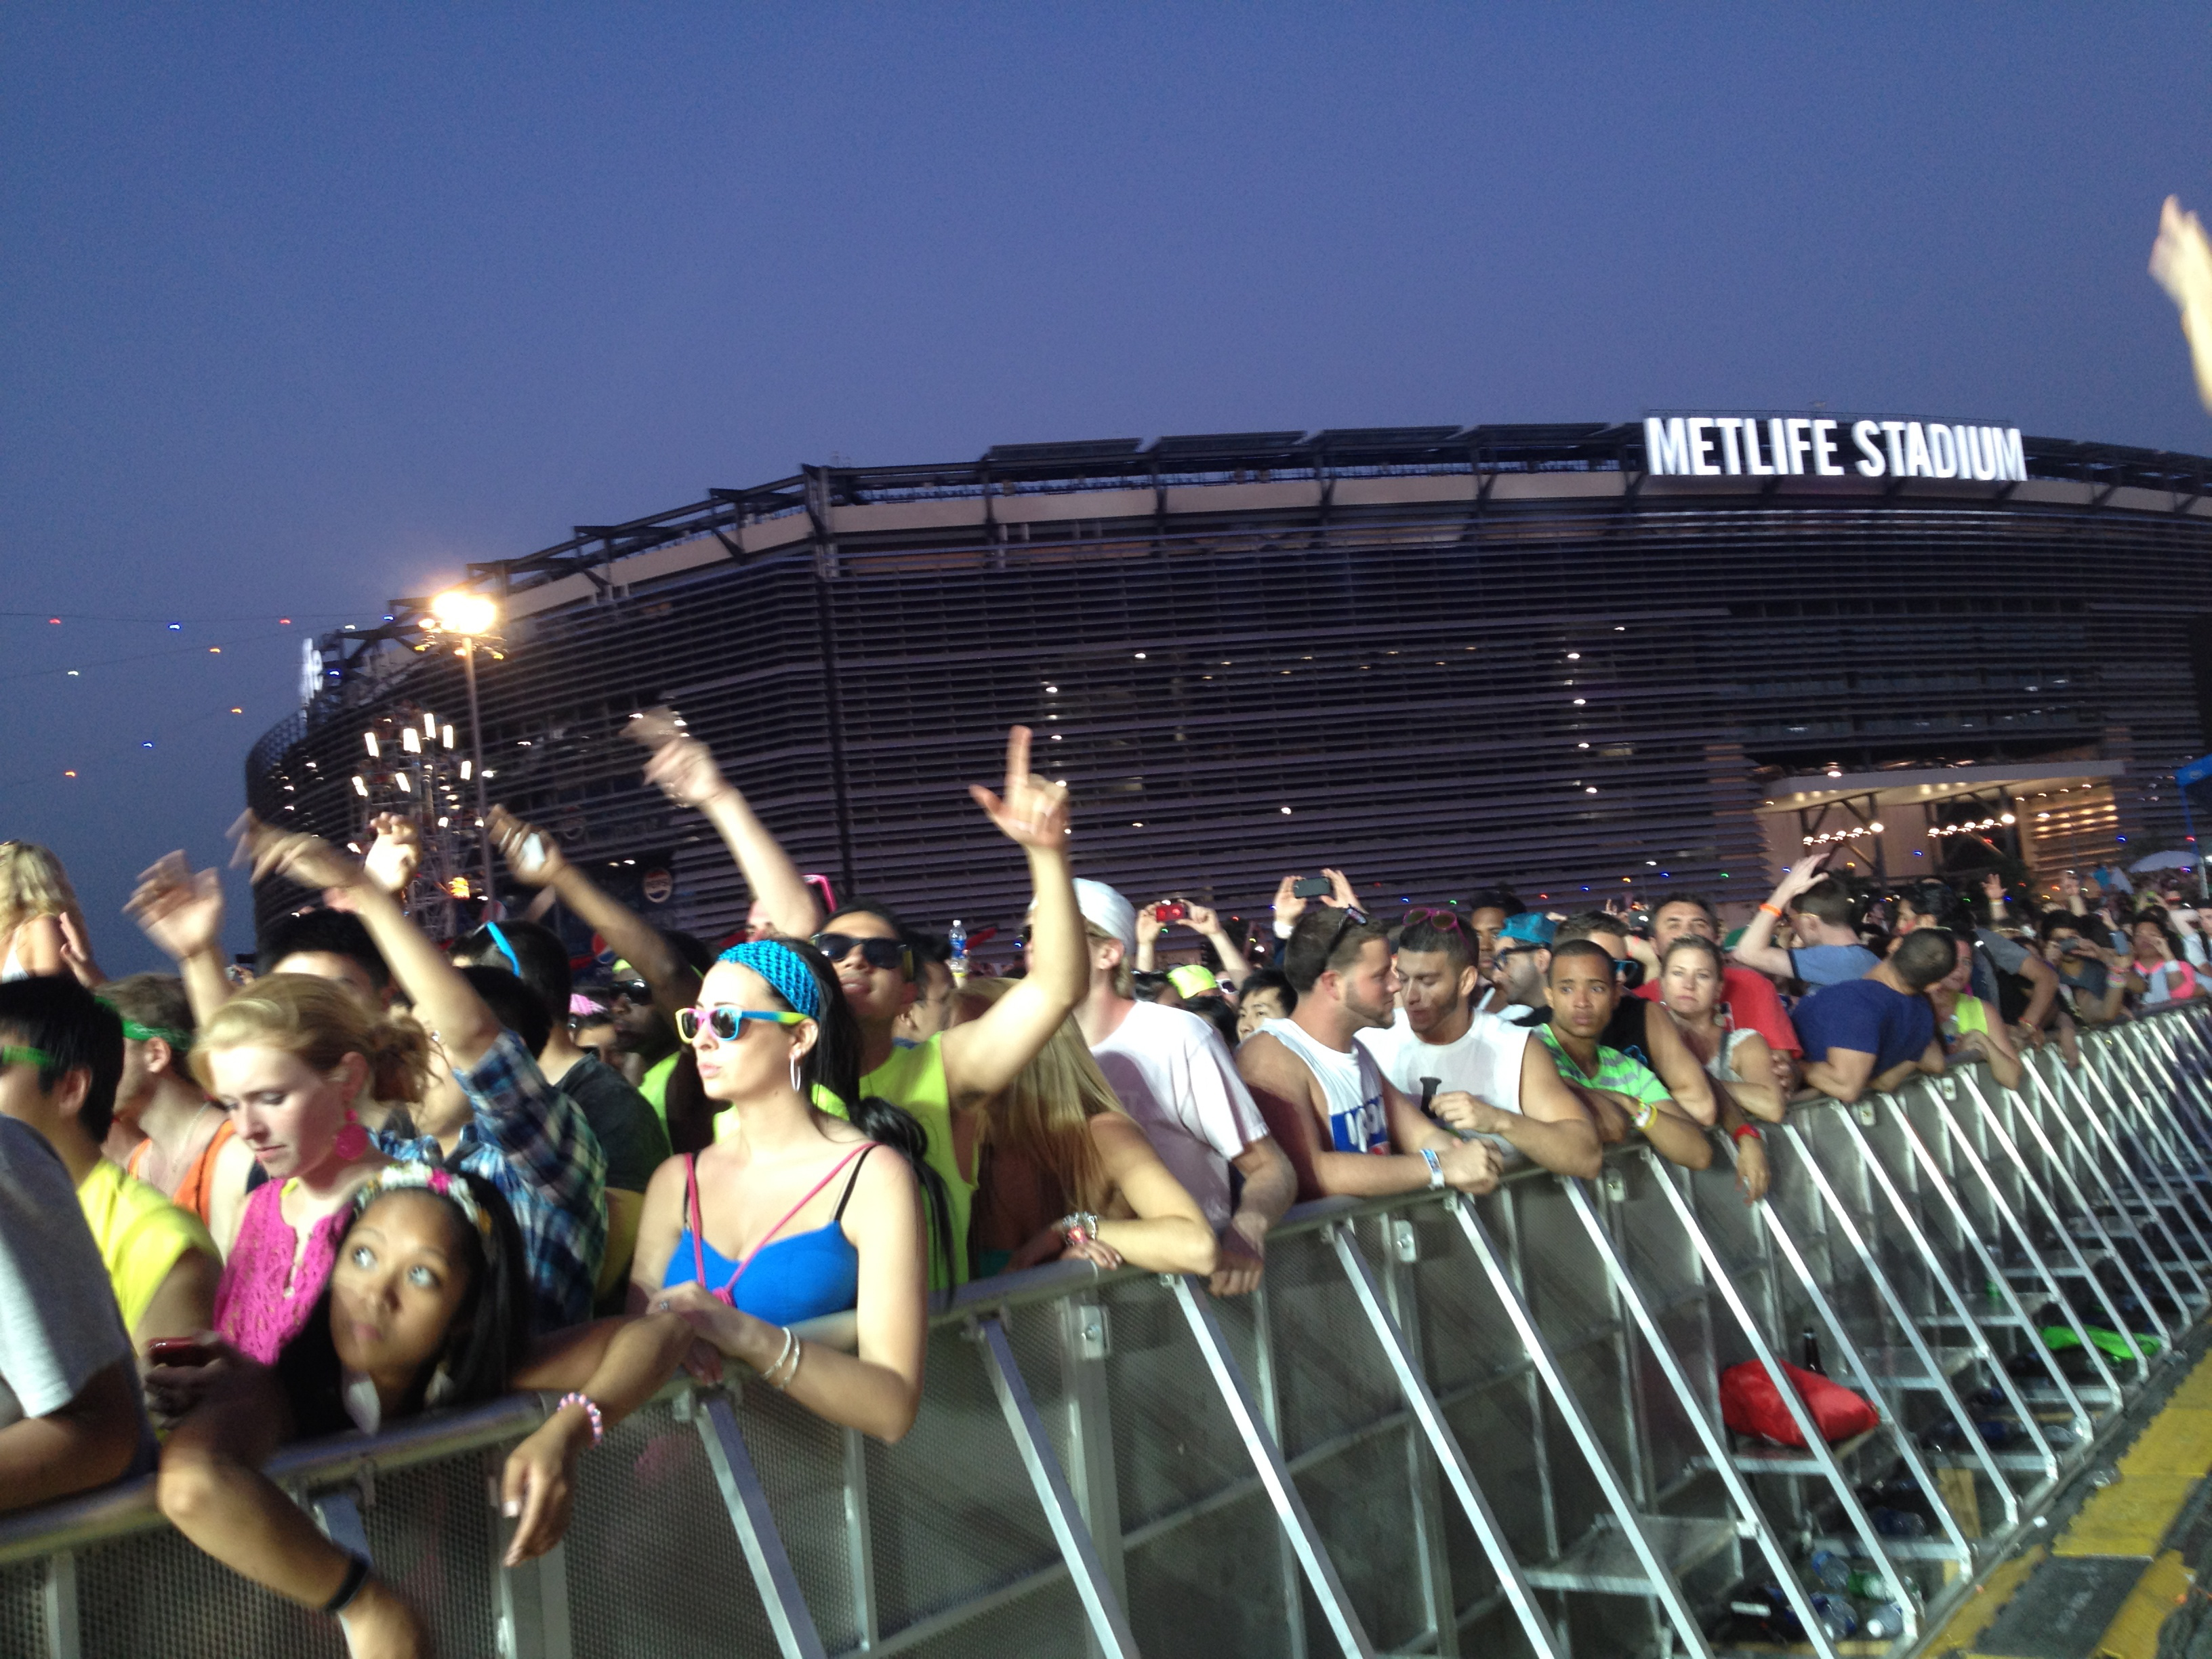 MetLife Stadium from EDC NY